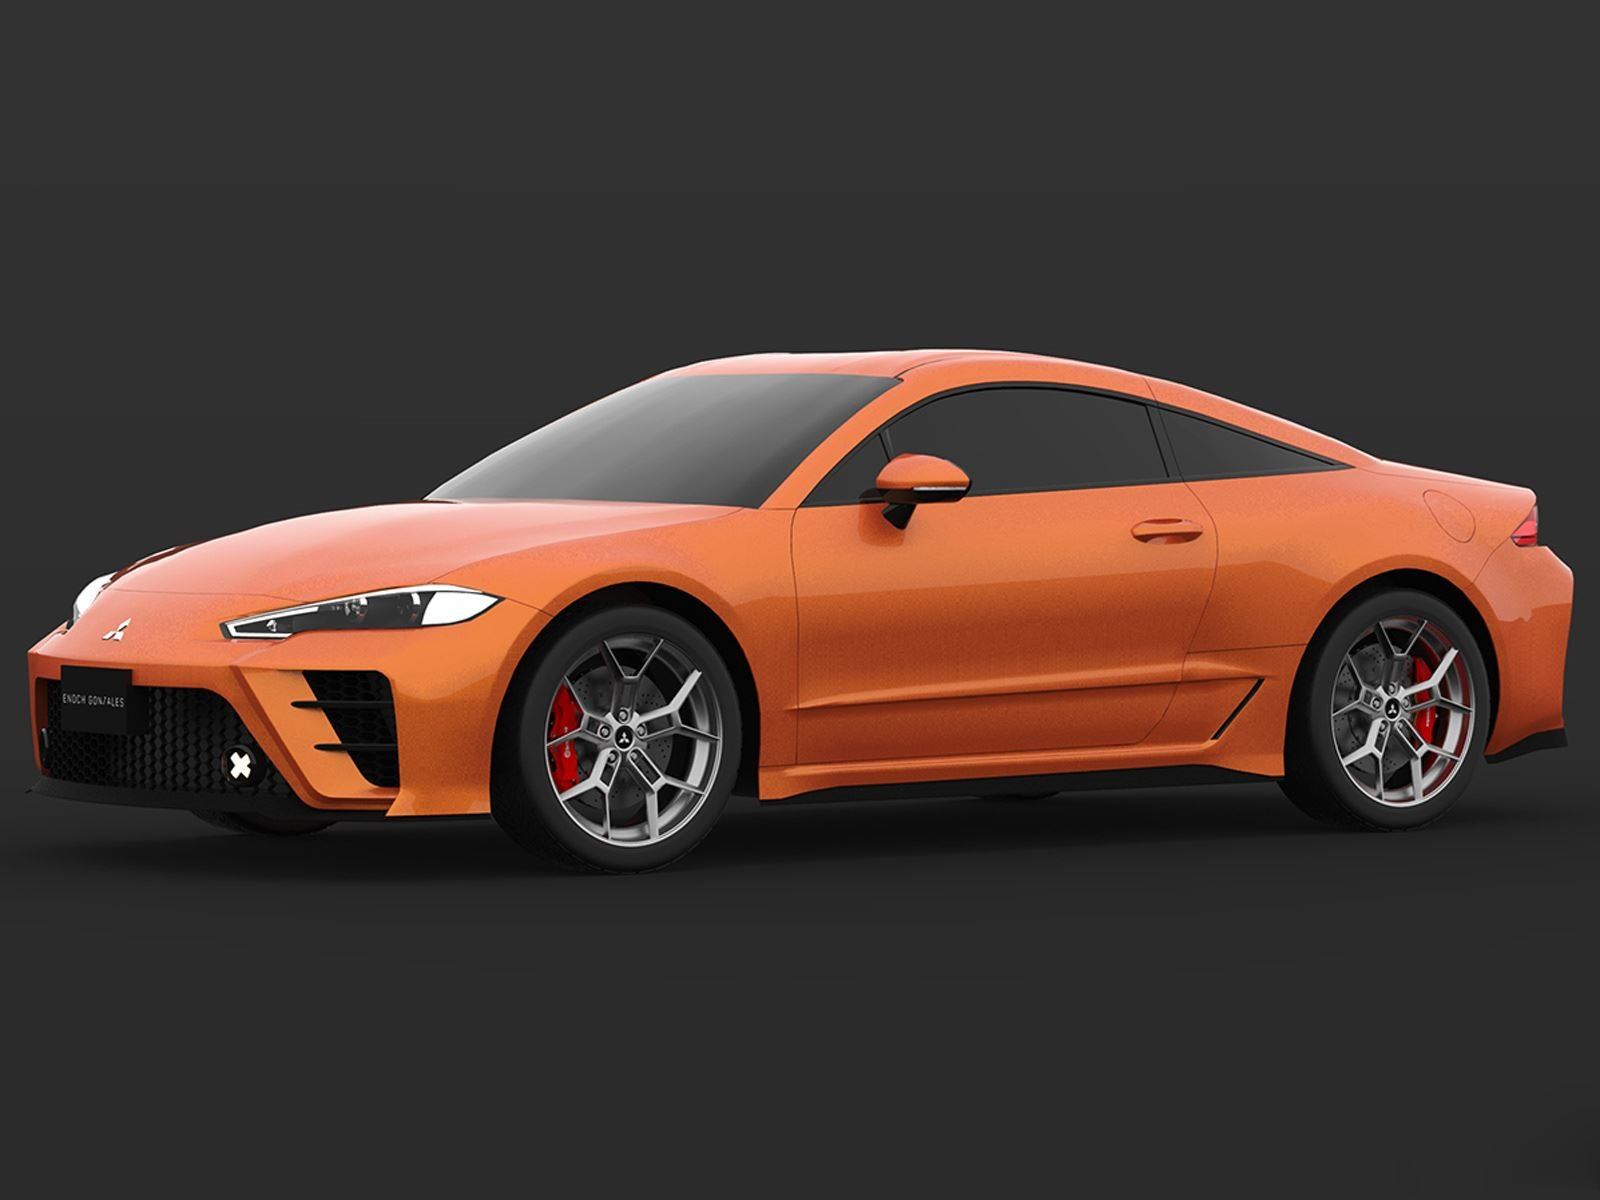 2020 Mitsubishi Eclipse R Pictures